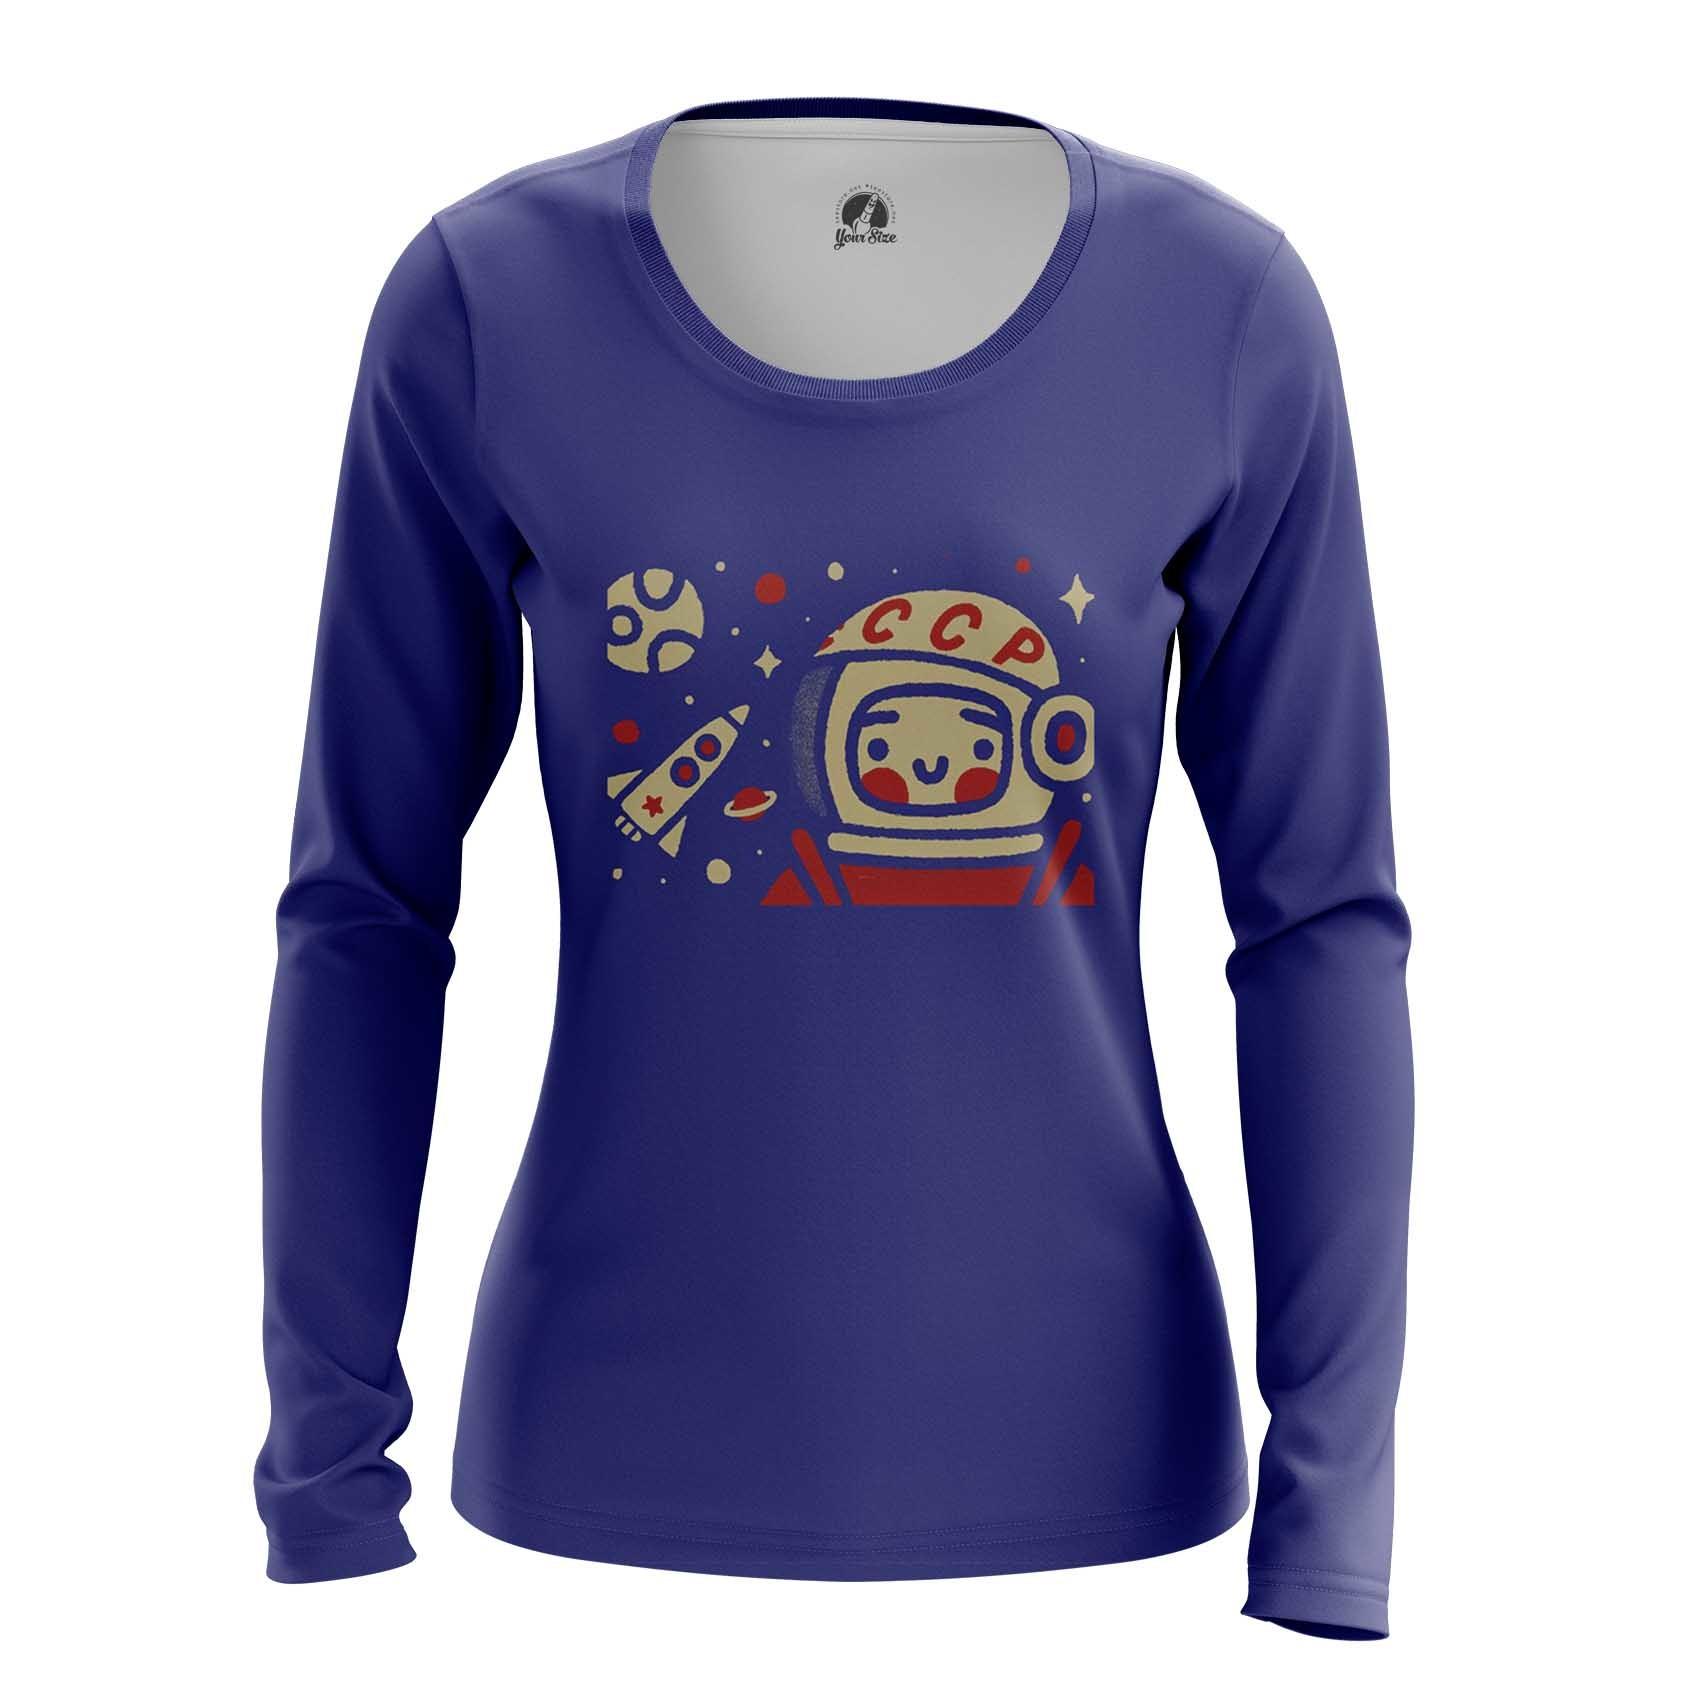 Collectibles Women'S Long Sleeve Yuri Gagarin Space Merch